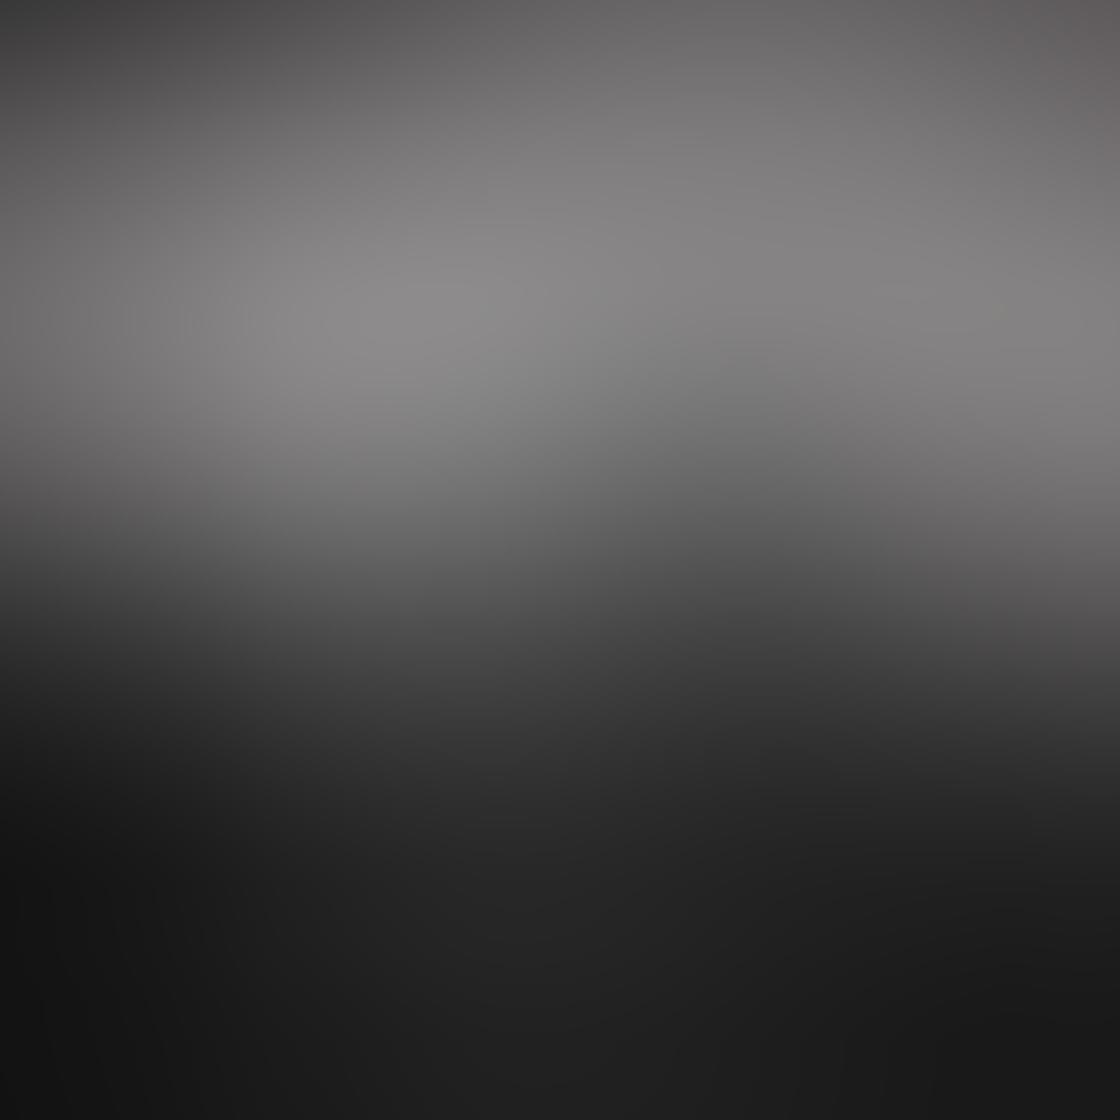 iPhone Silhouette Photos 10